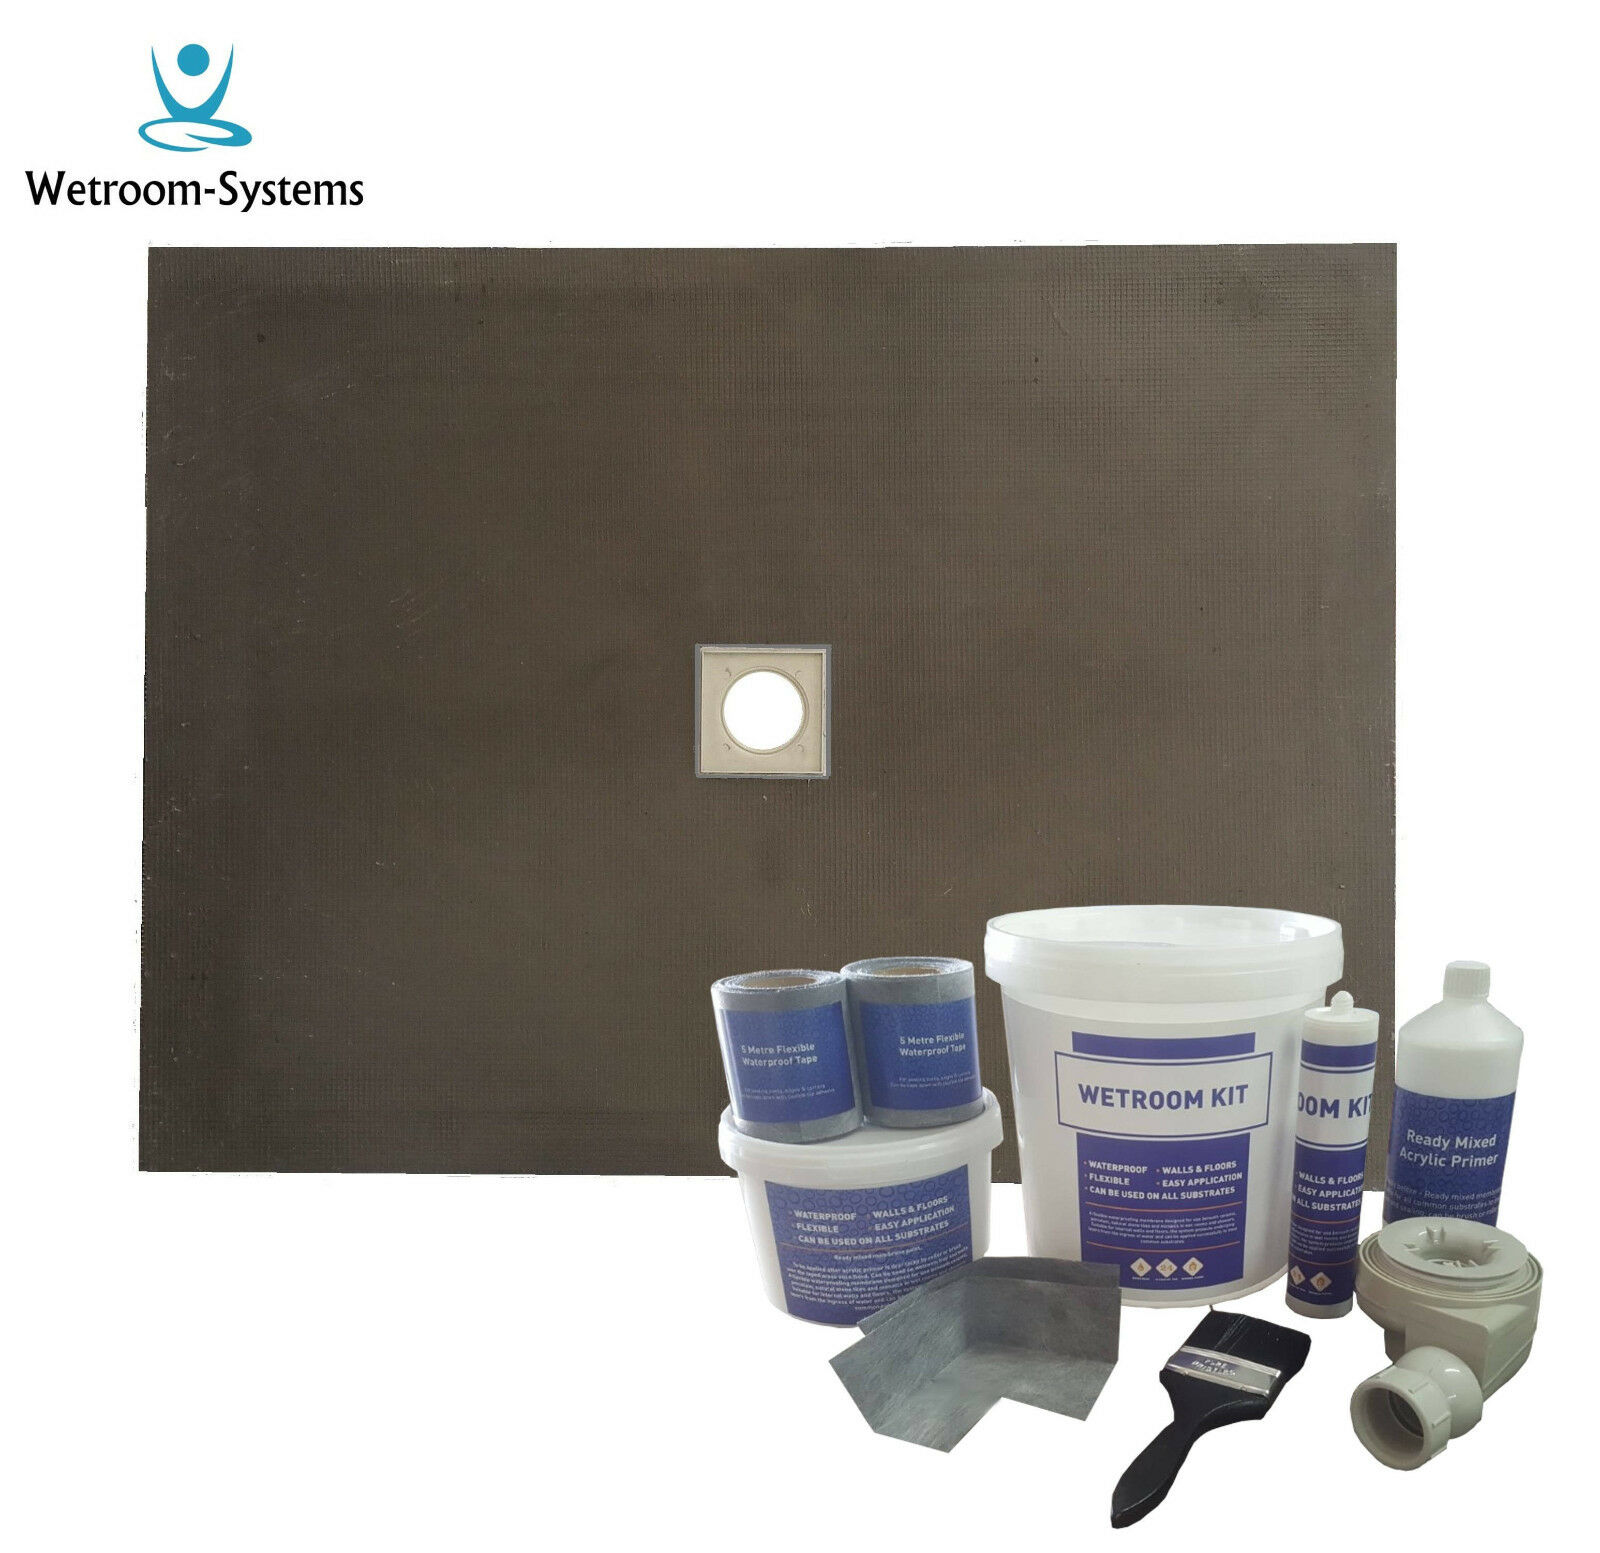 Pièce Humide & pièces humides kit 800 x 800 x 20 mm Bac Douche Base & lache Kit (N B)